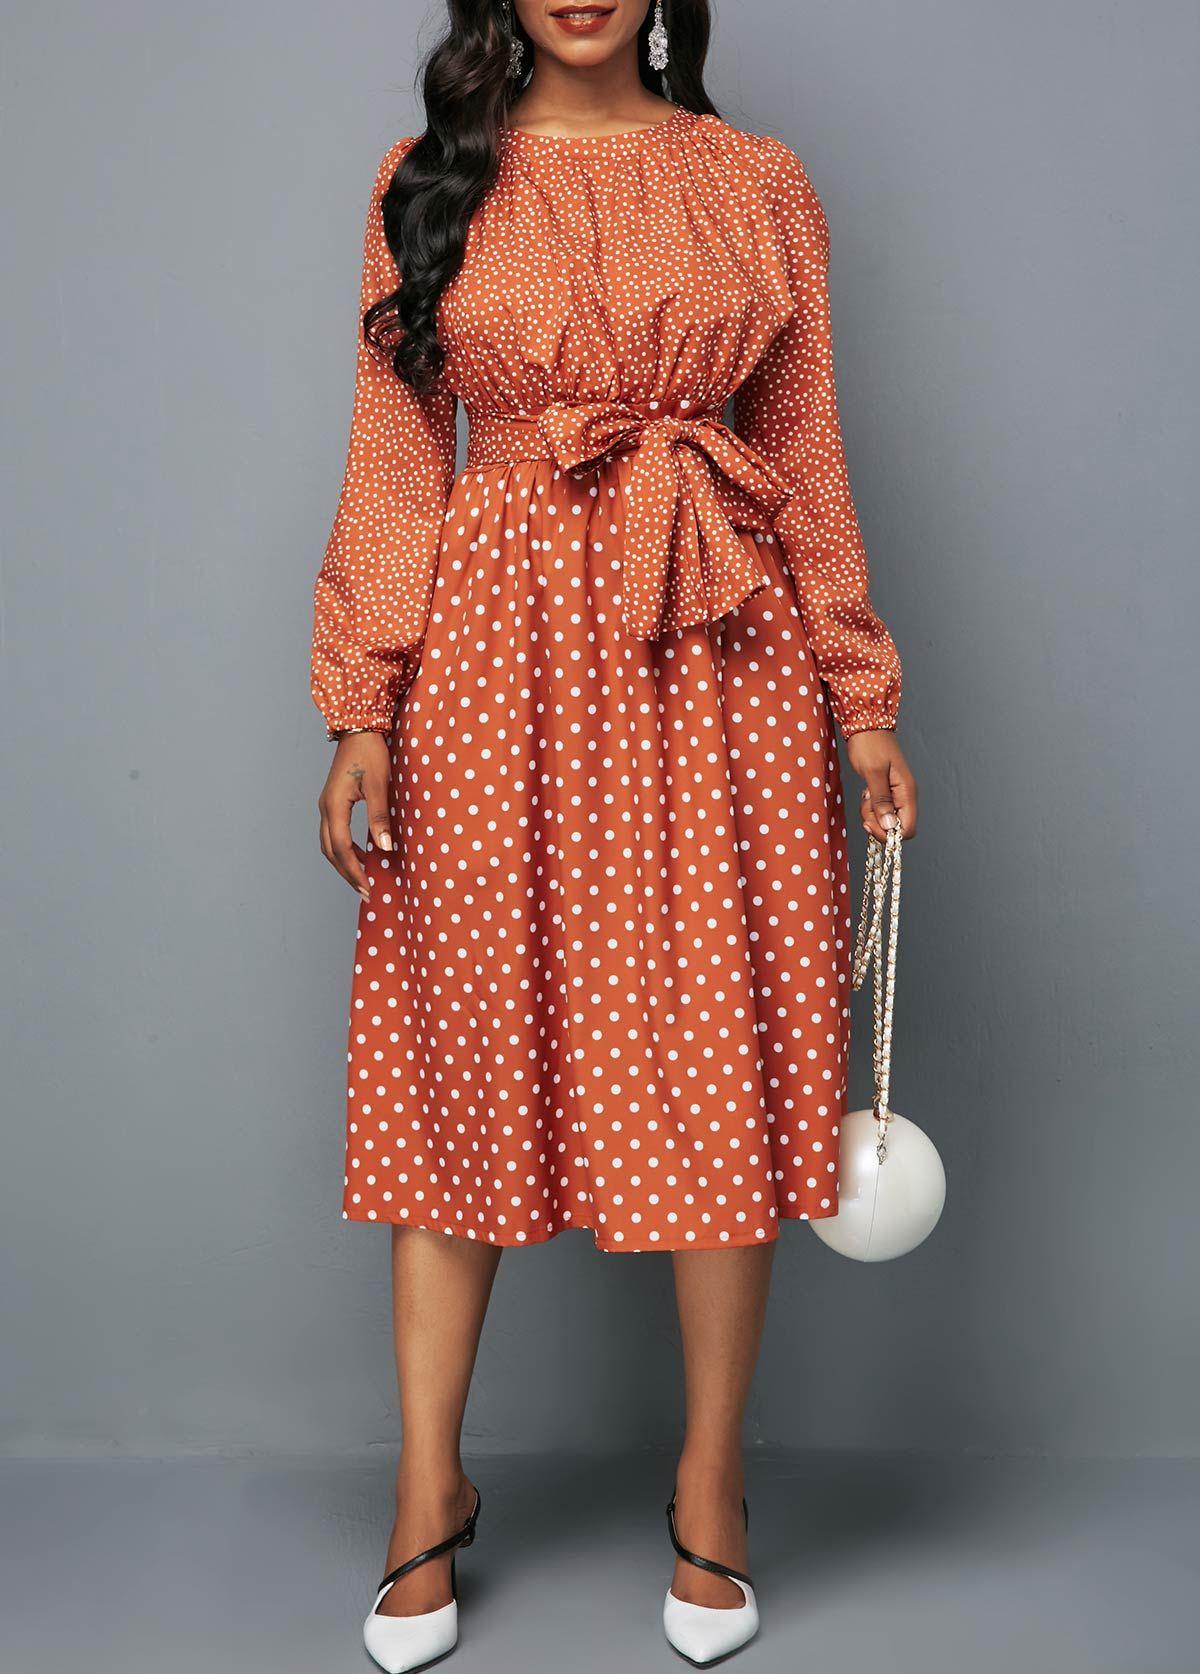 Round Neck Belted Long Sleeve Polka Dot Dress Rotita Com Usd 28 63 Shop Casual Dresses Dresses Belted Dress [ 1674 x 1200 Pixel ]